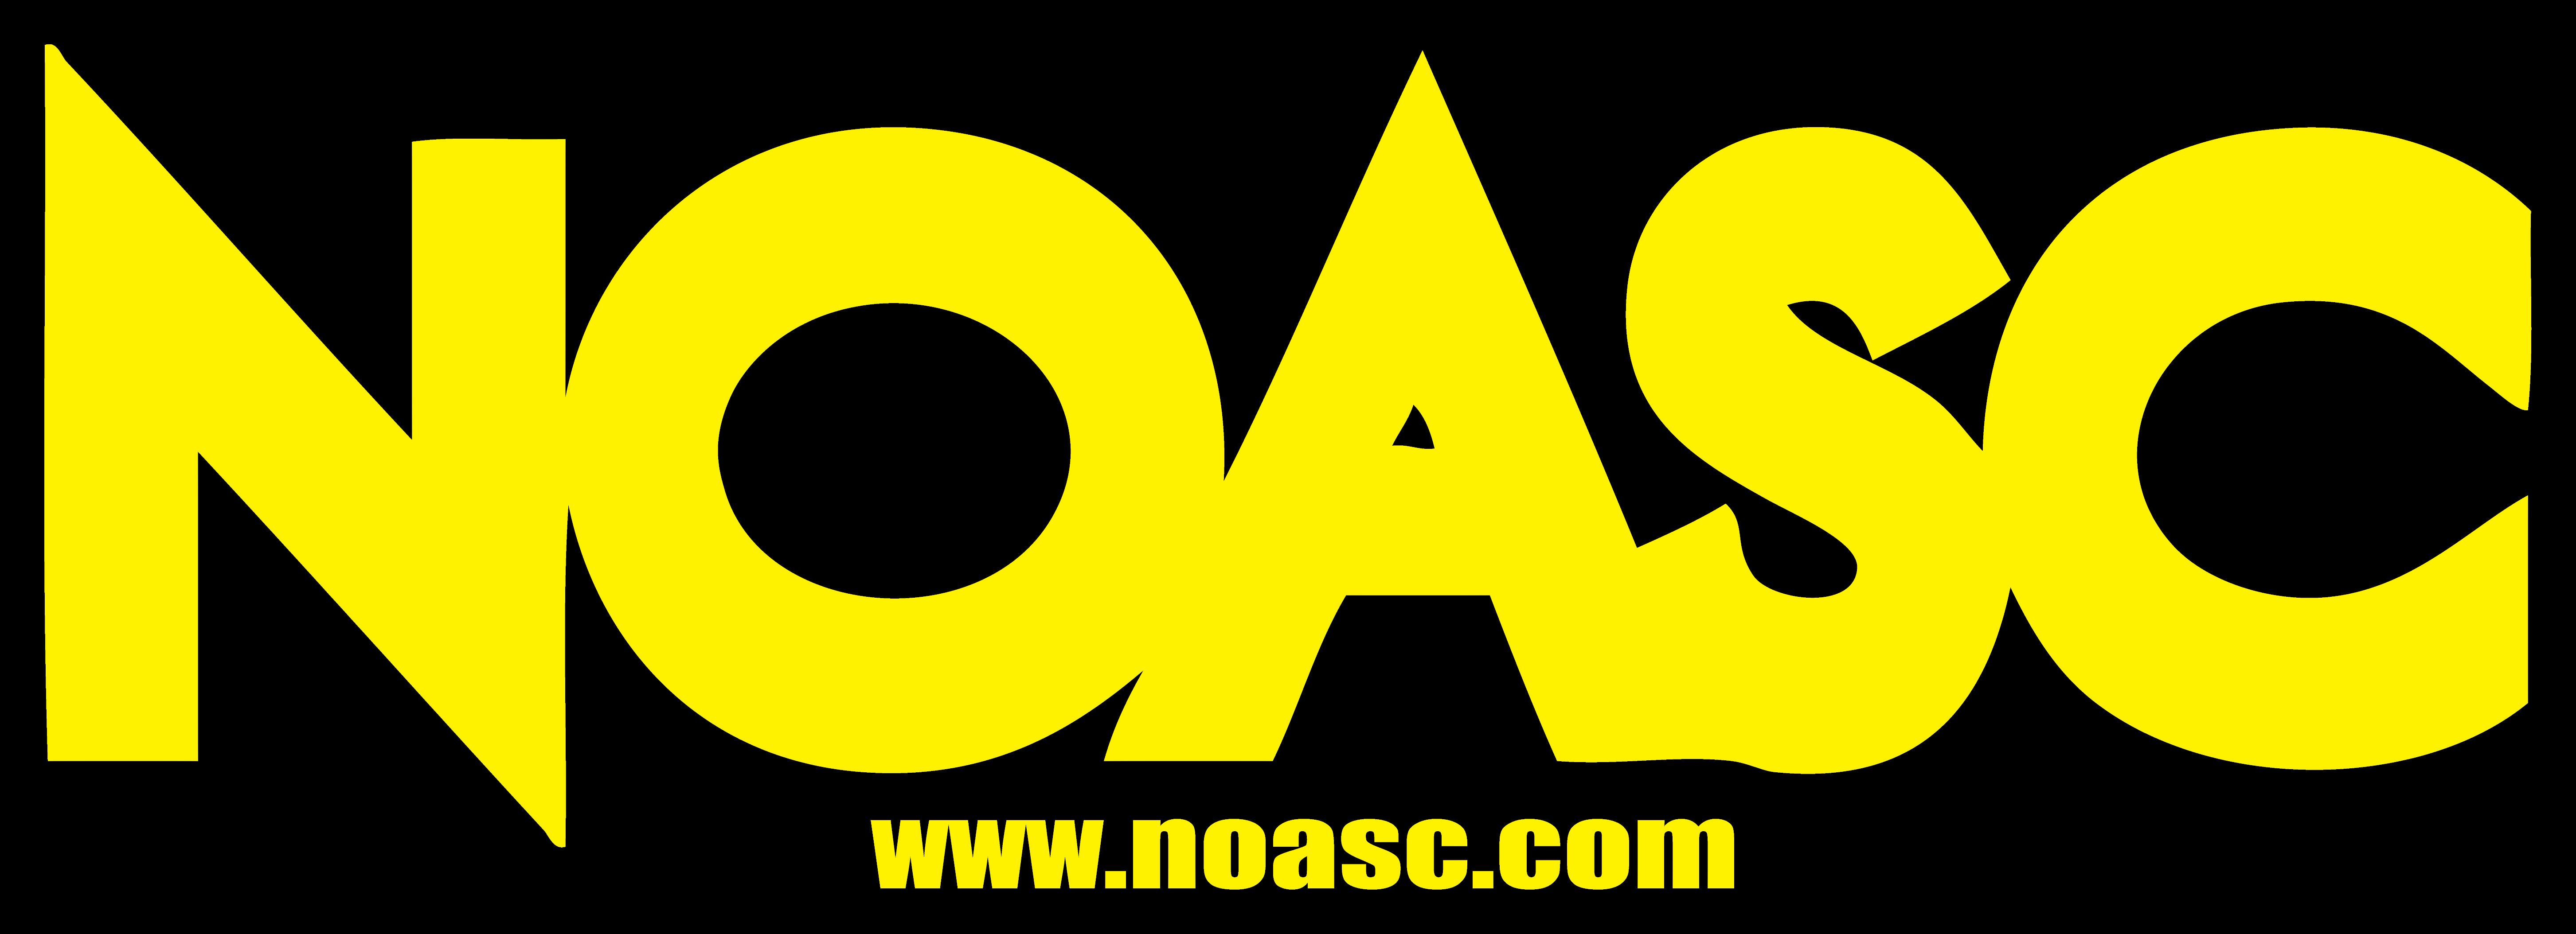 NOASC Adventure Tours logo